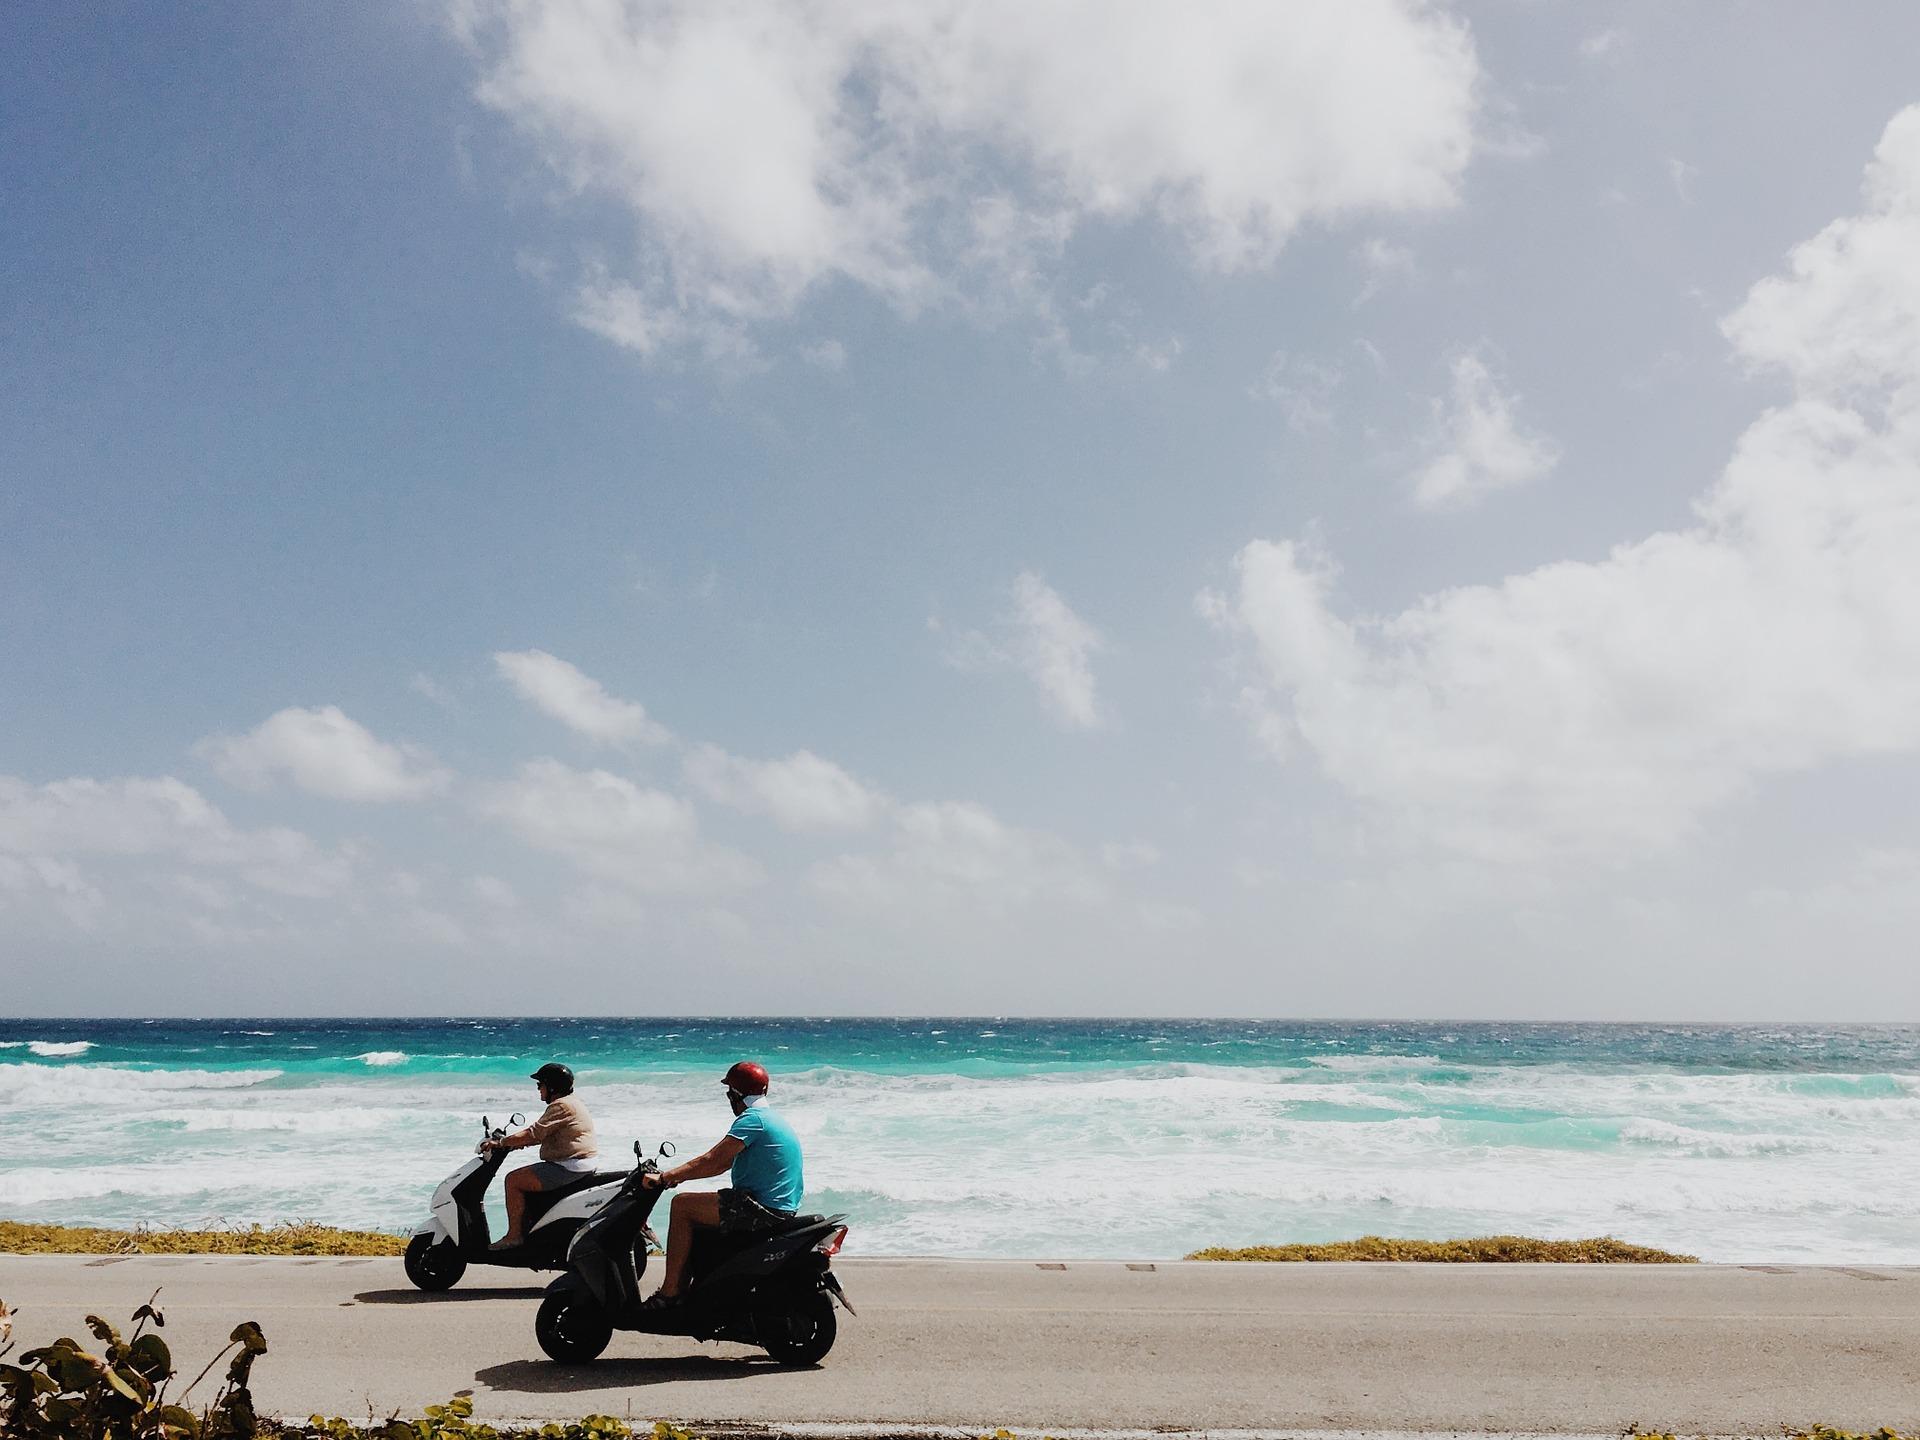 beach-scooter